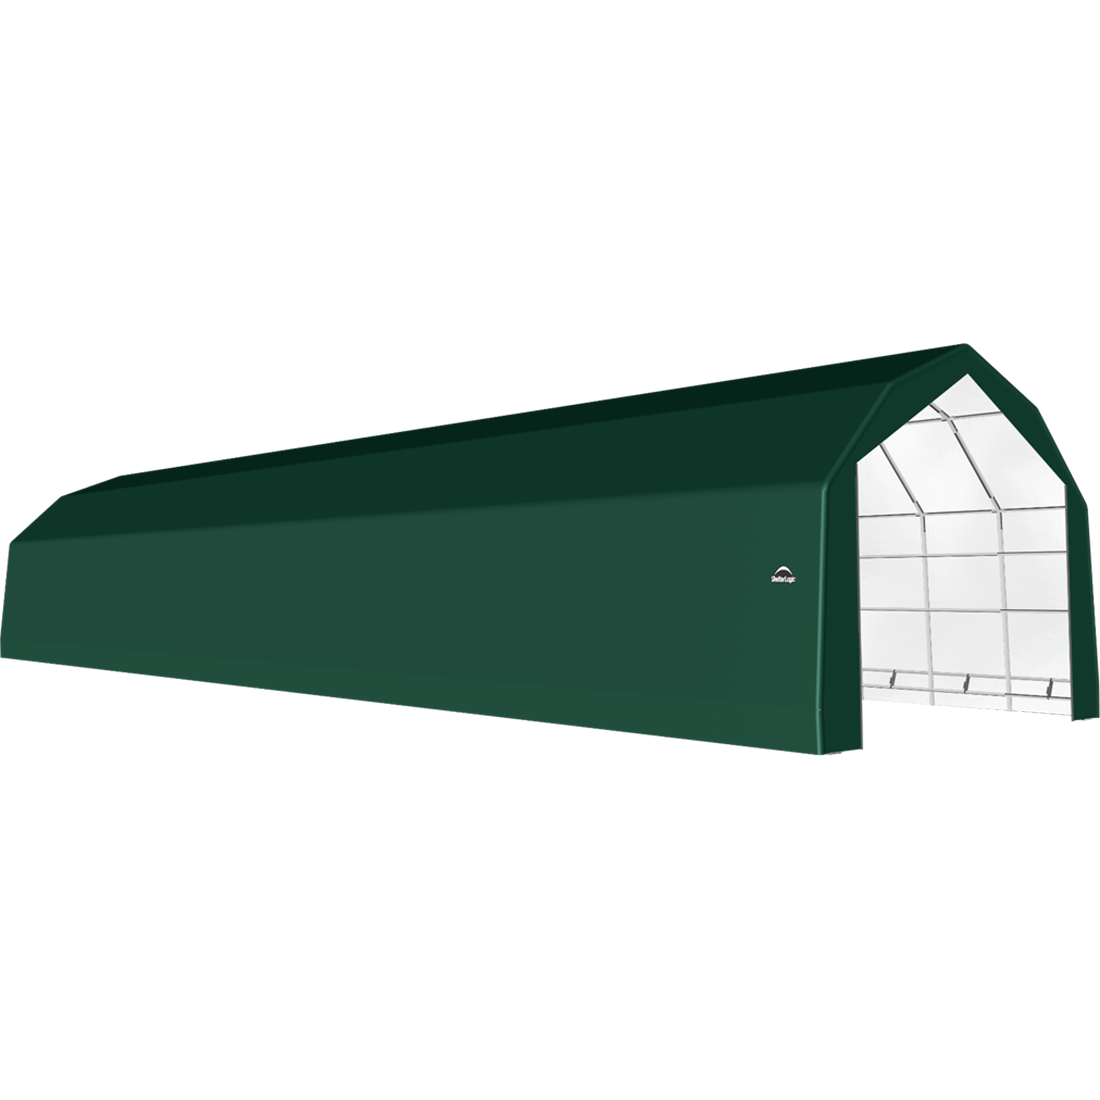 SP Barn 20X72X15 Green 14 oz PE Shelter